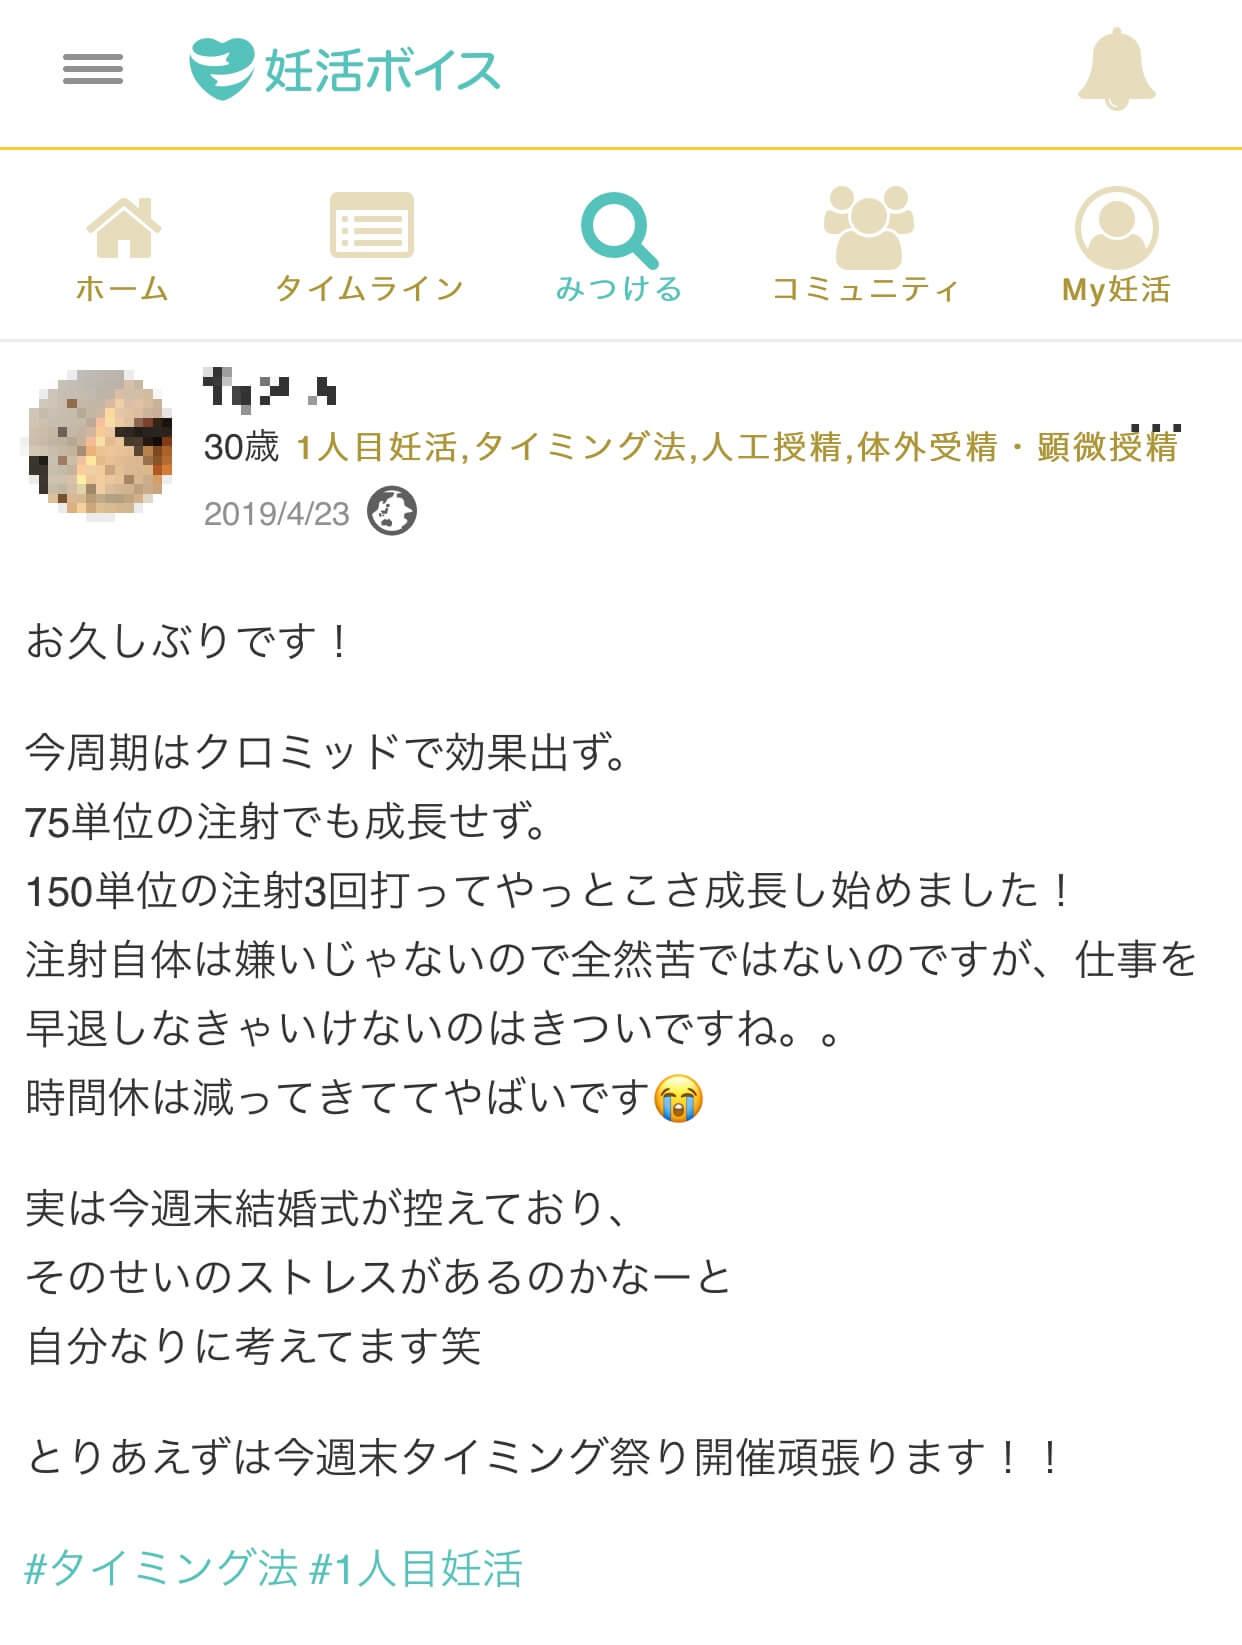 Nさん(30歳・1人目妊活・タイミング法・人工授精・体外受精・顕微授精)